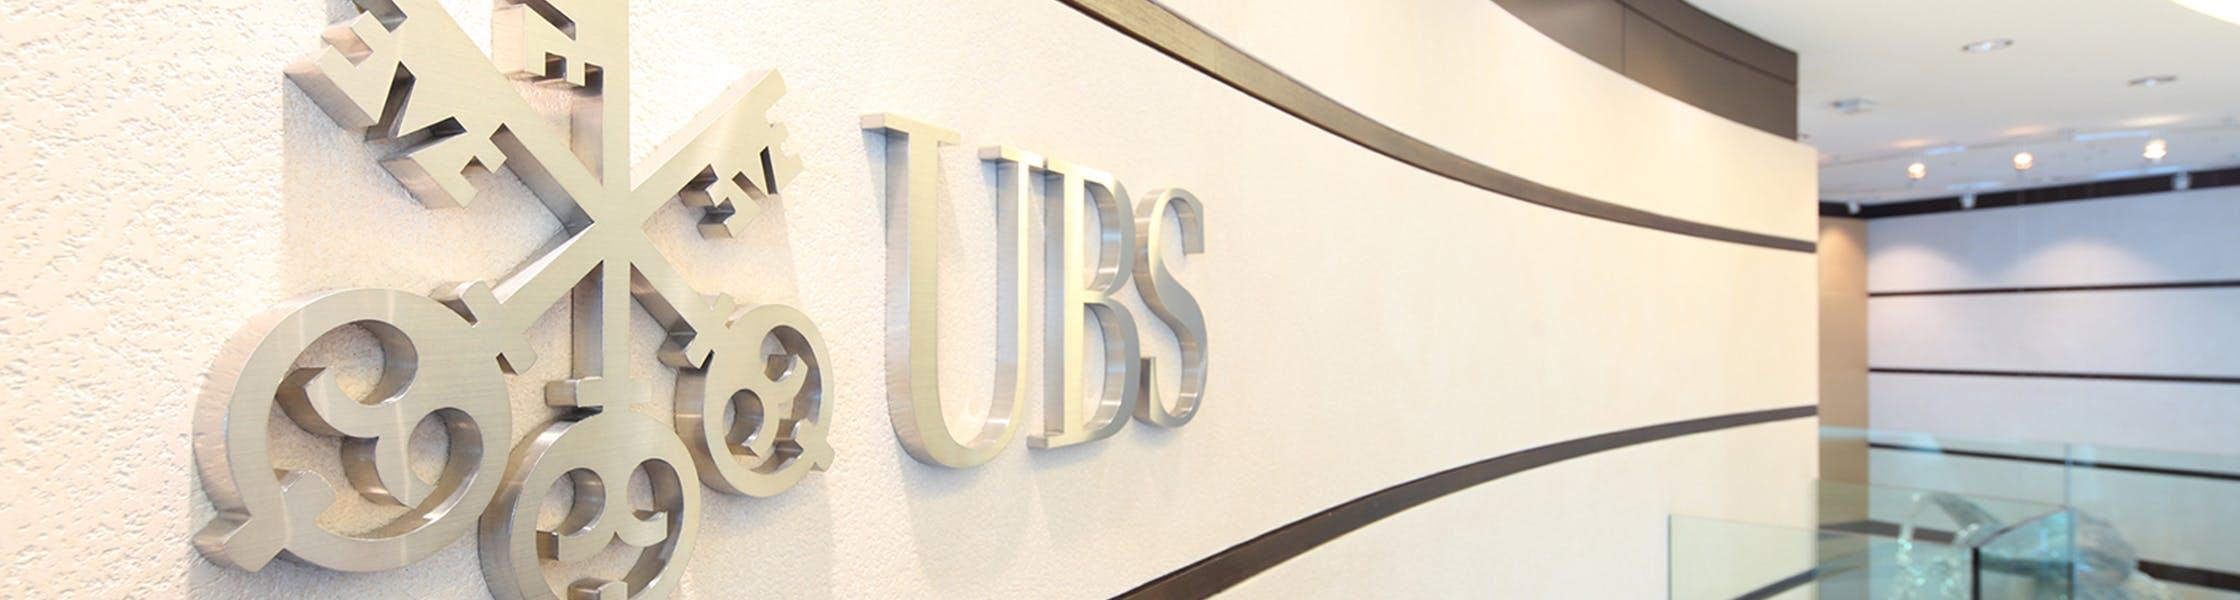 Ubs 1120x300 2x.jpg?ixlib=rails 3.0